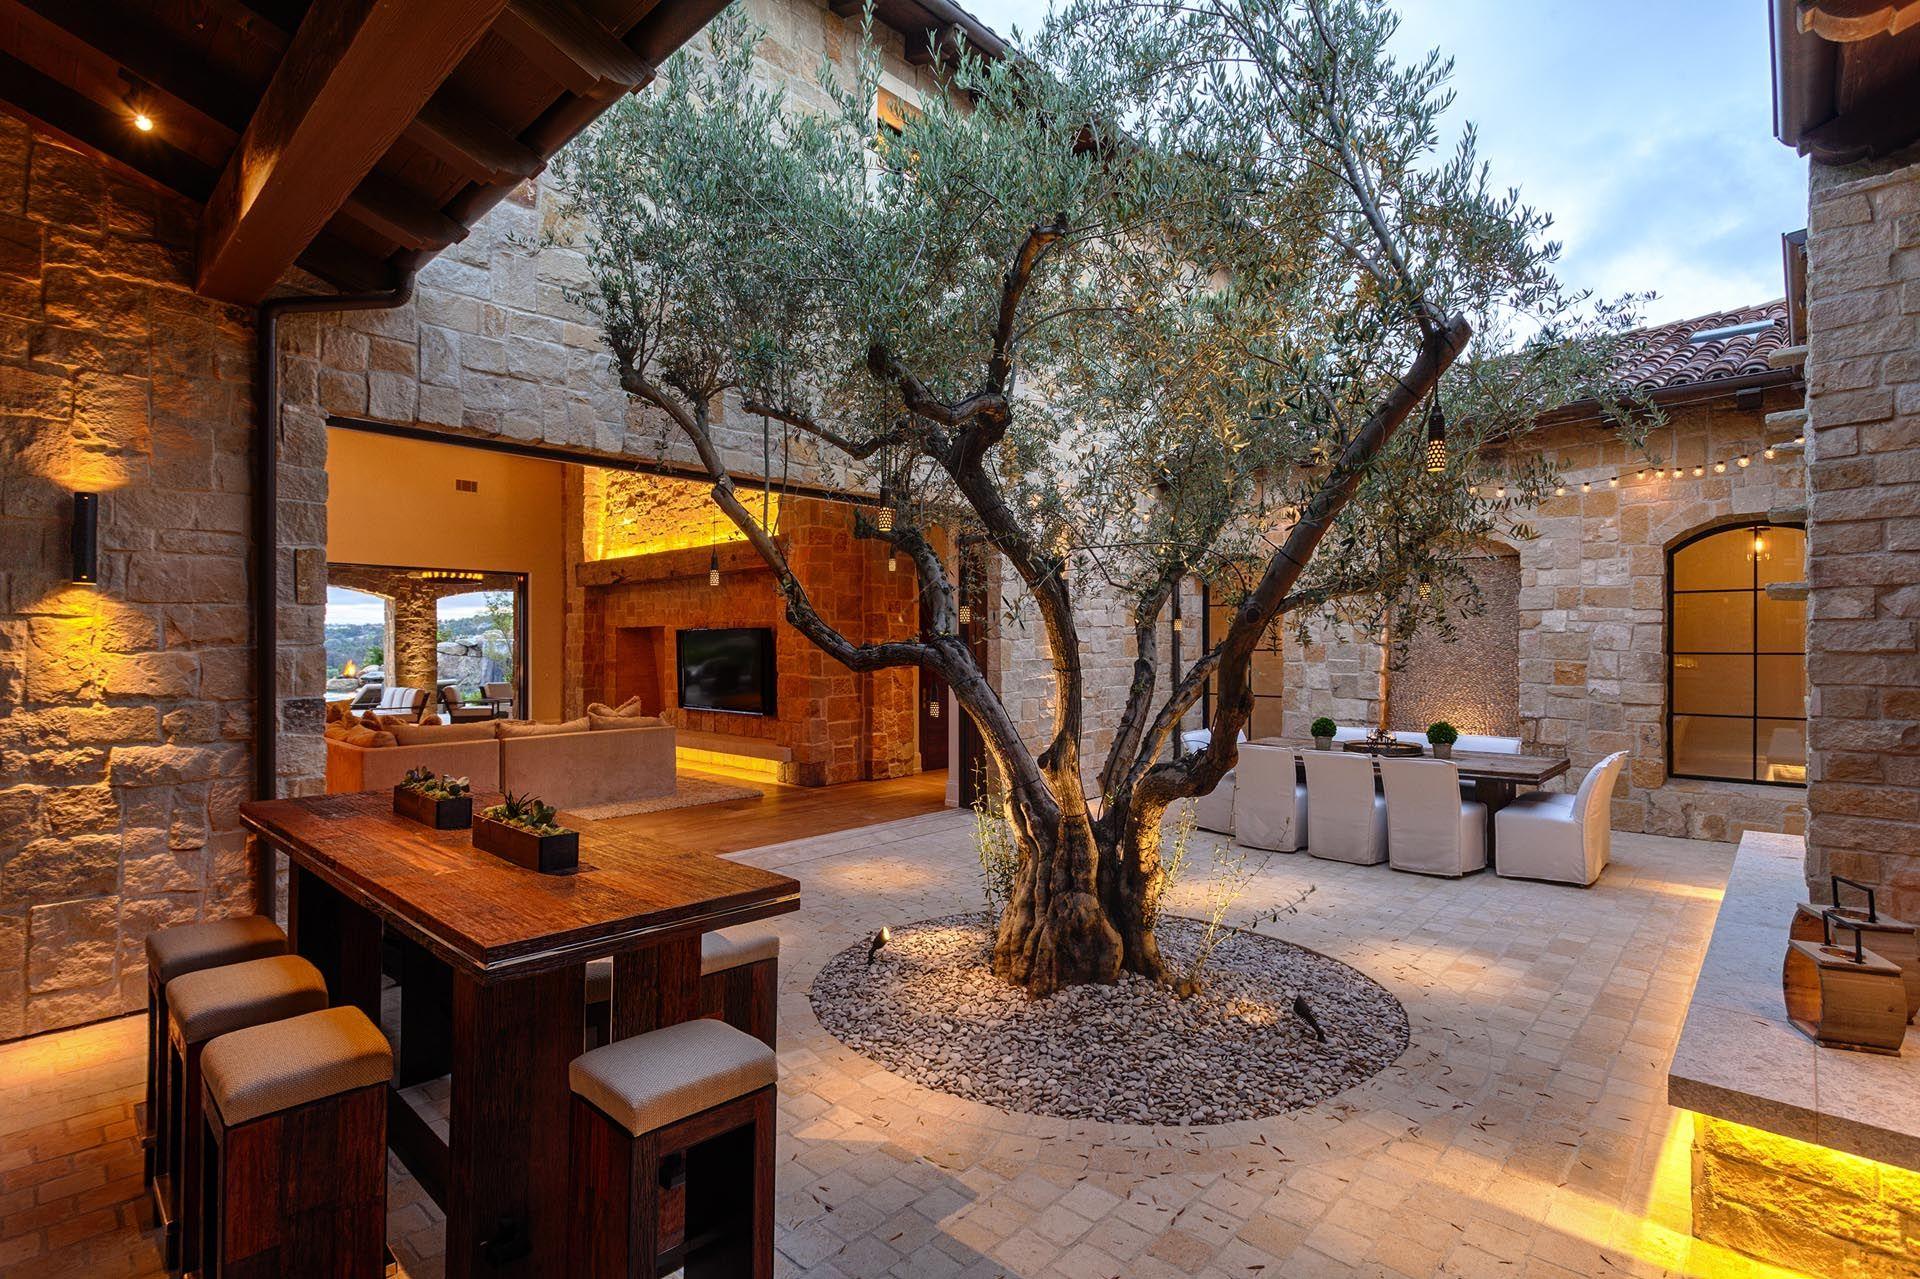 50 Best Patio Ideas For Design Inspiration Courtyard House Patio Design Patio